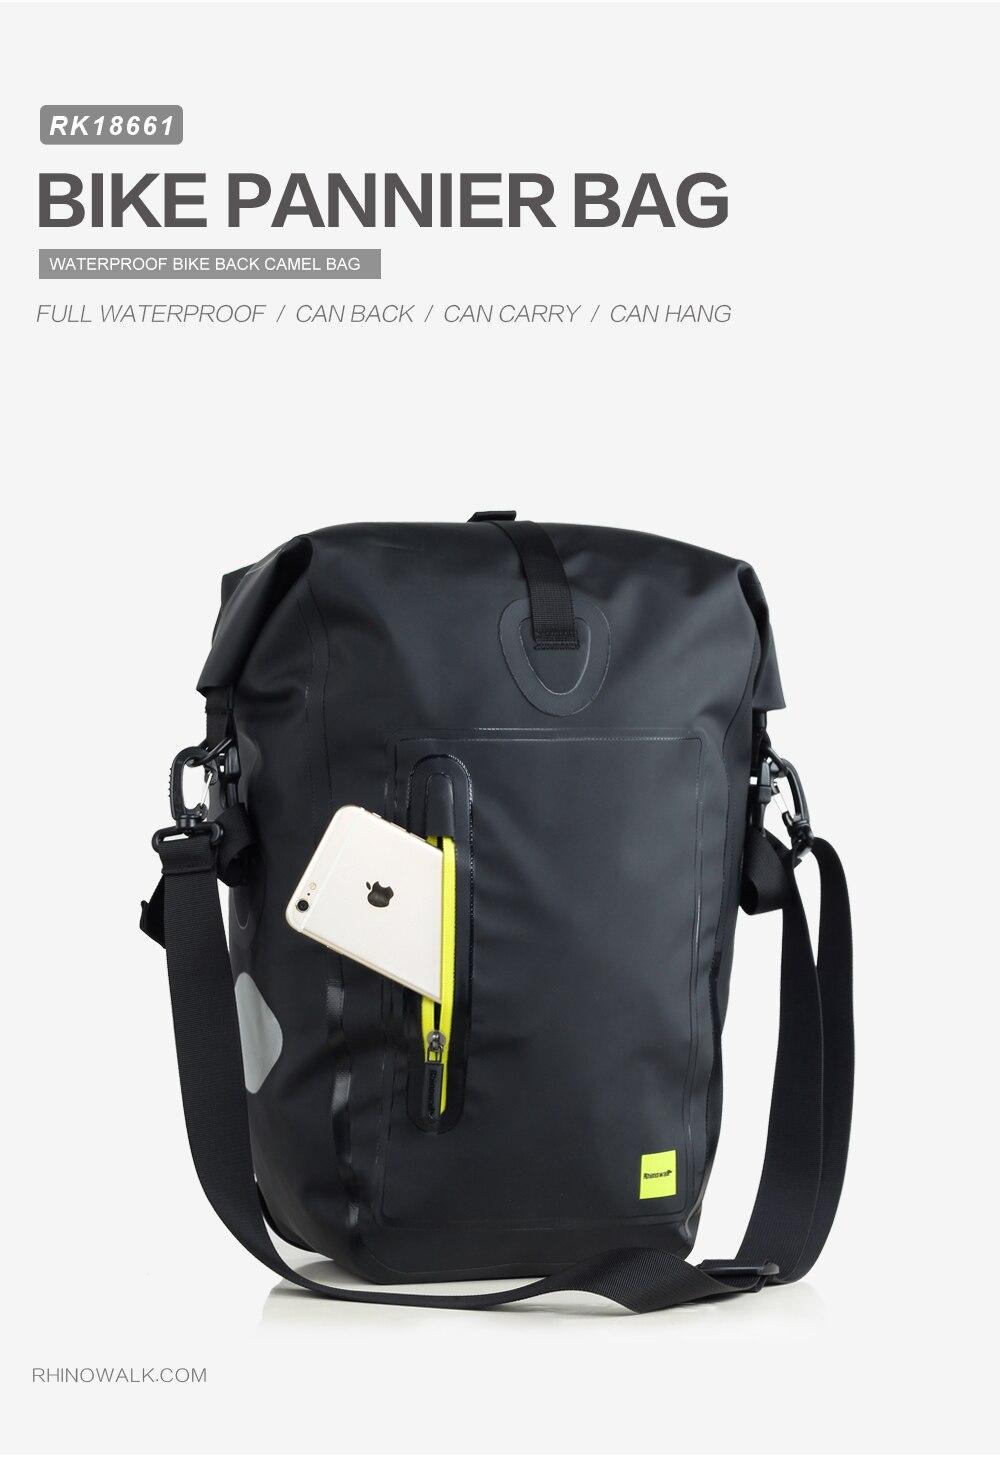 Waterproof cycling bike pannier bag (1)